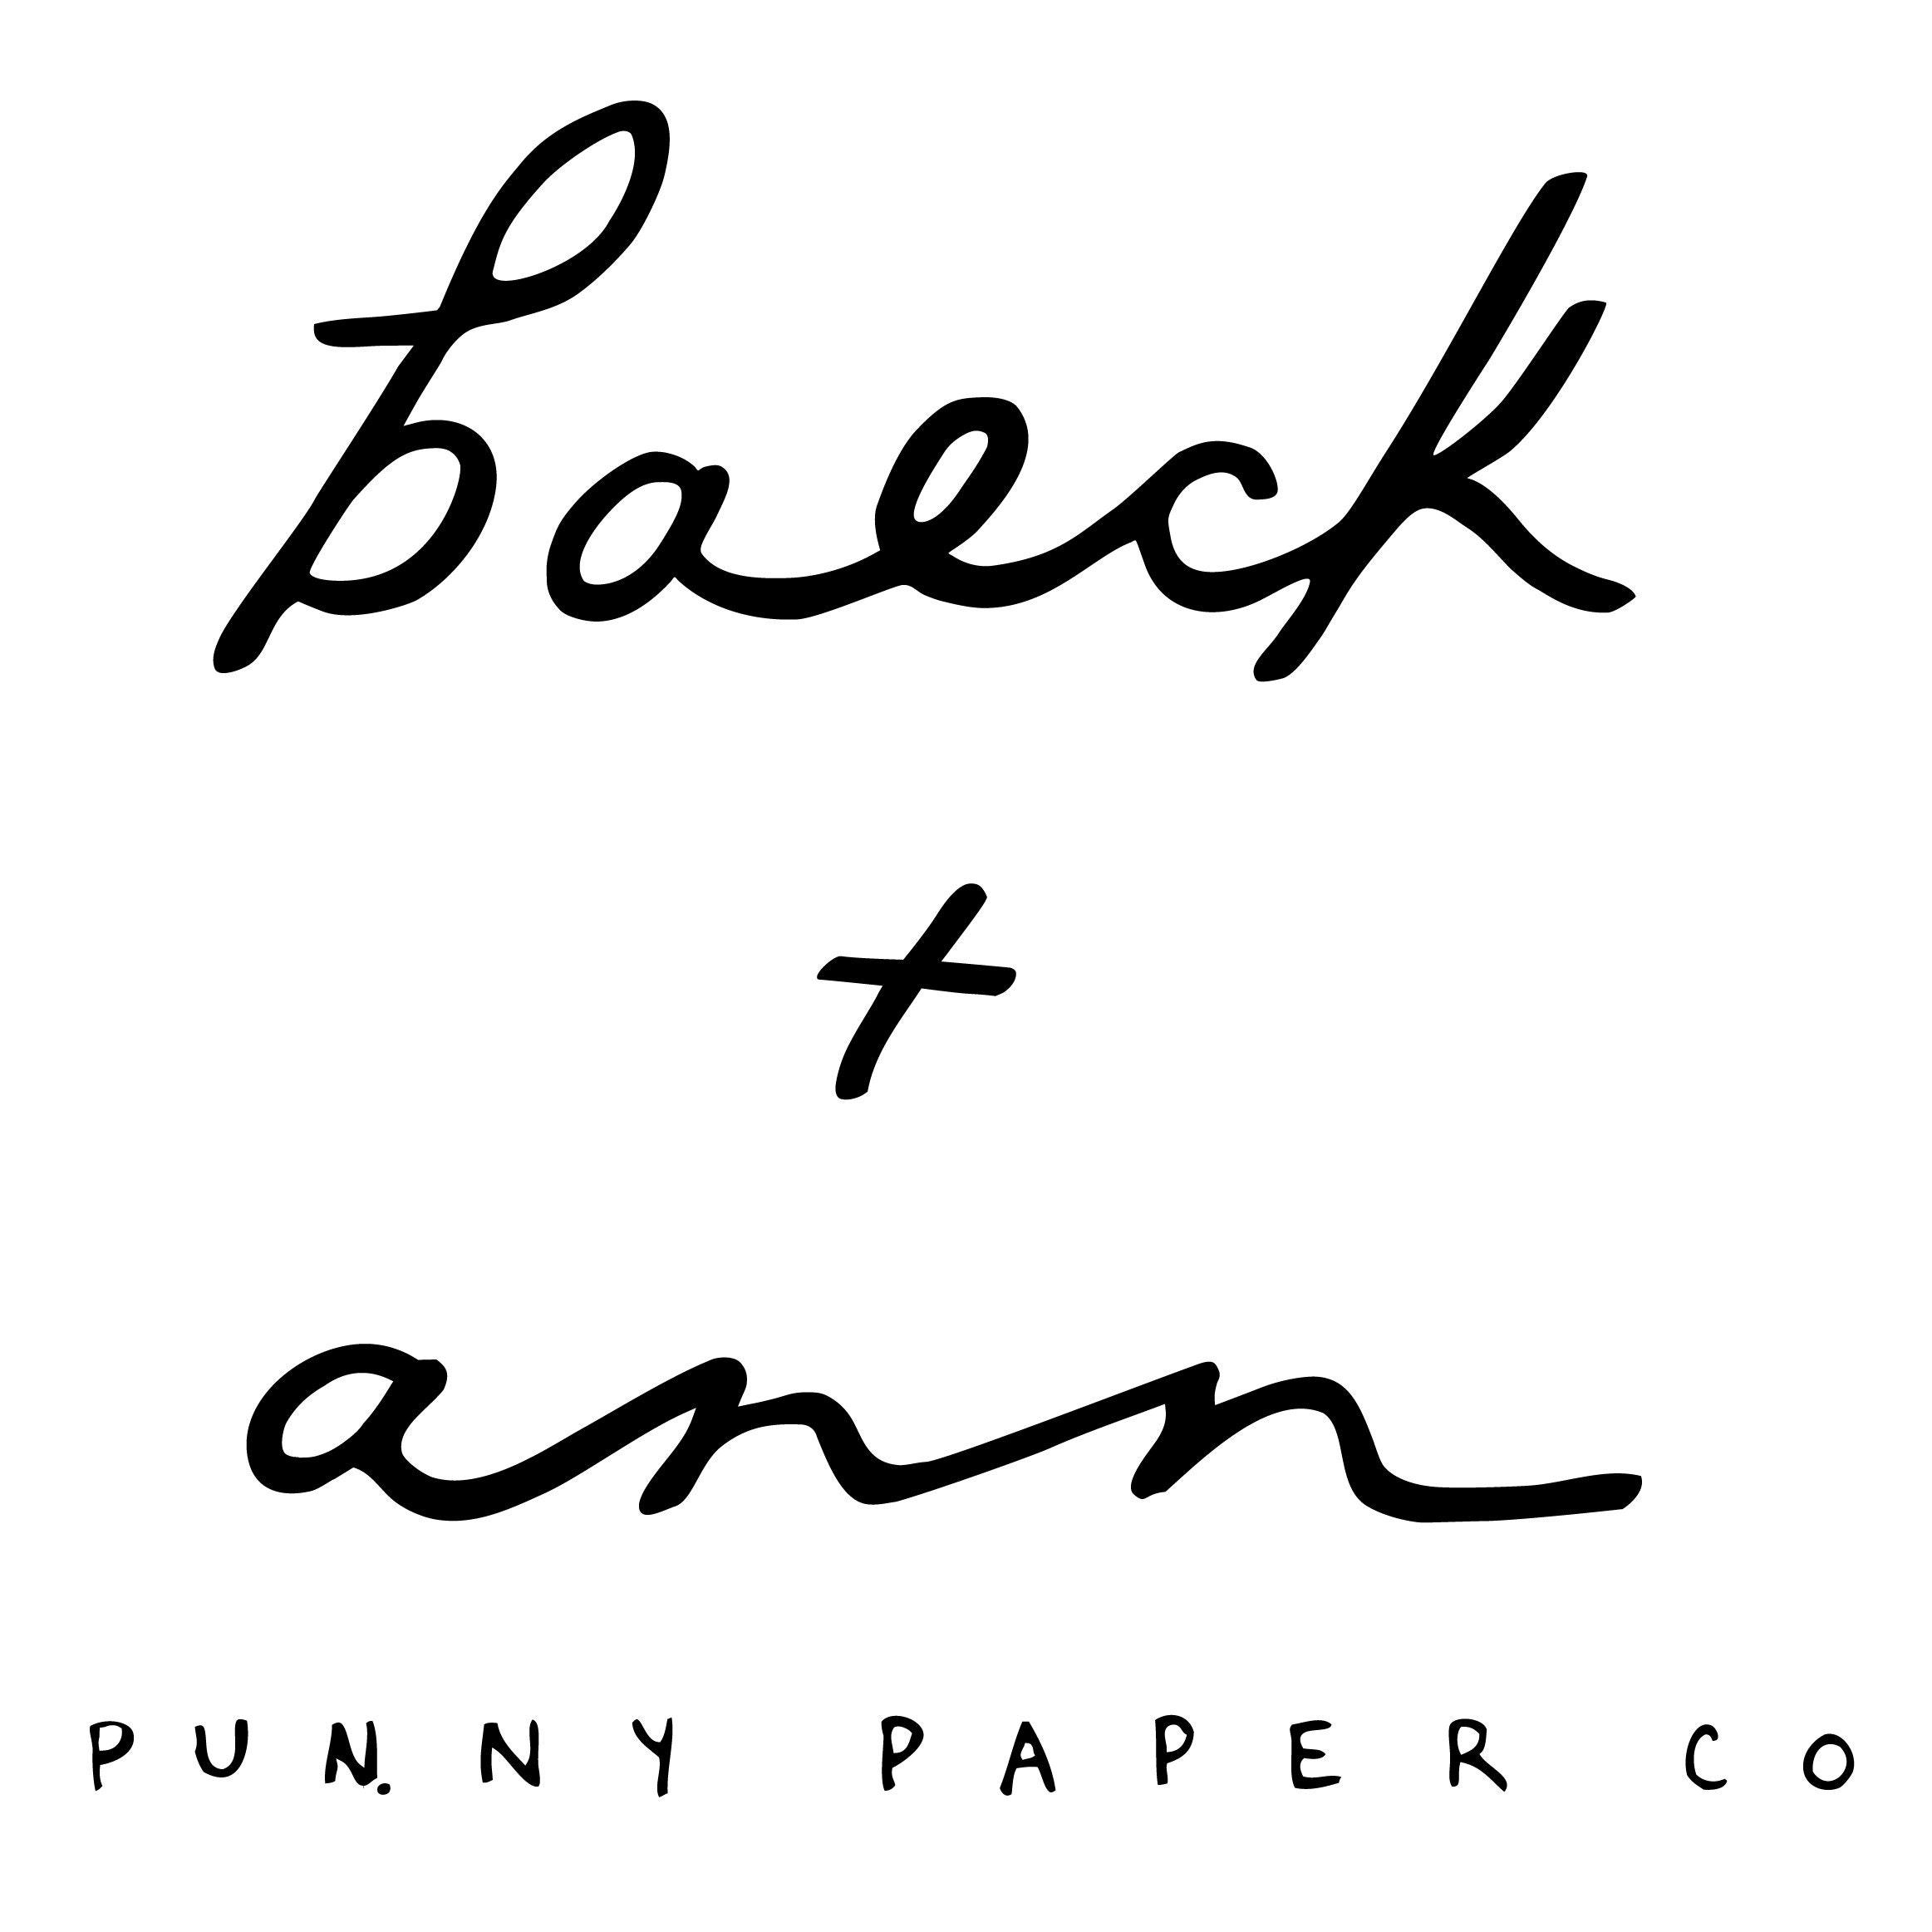 Punny & Funny Greeting Cards von BAECKANN auf Etsy